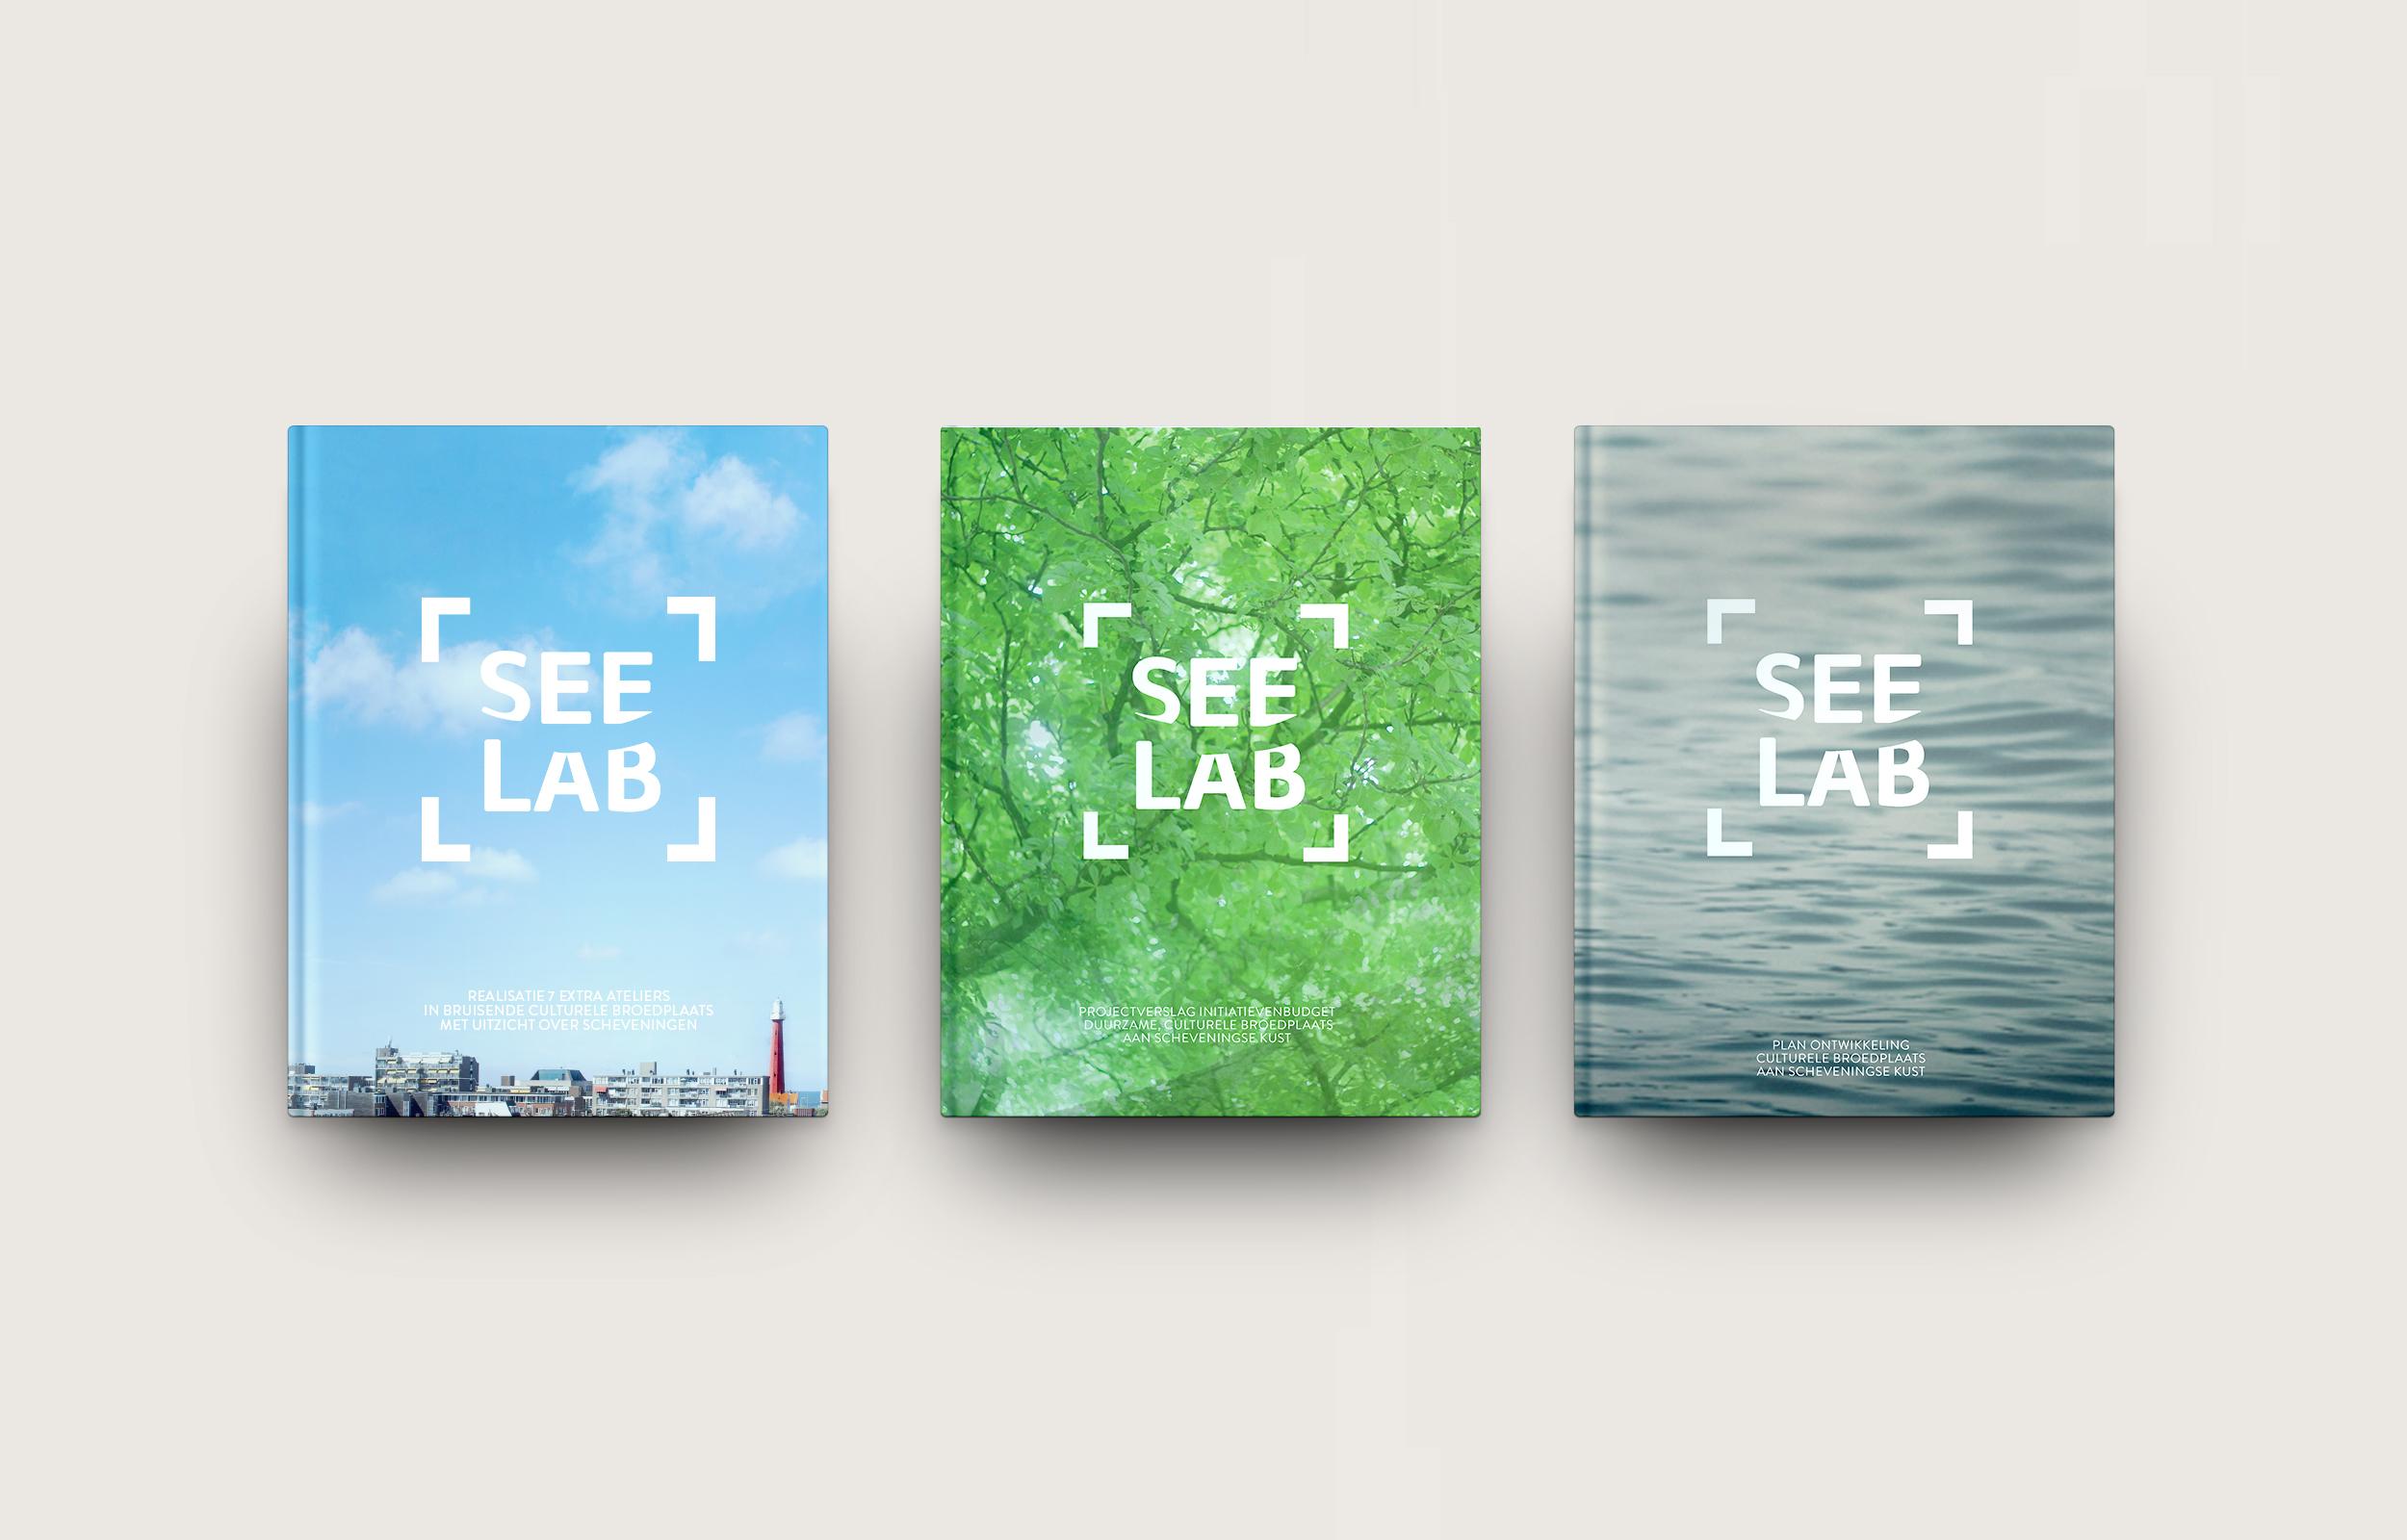 seelab-project.jpg